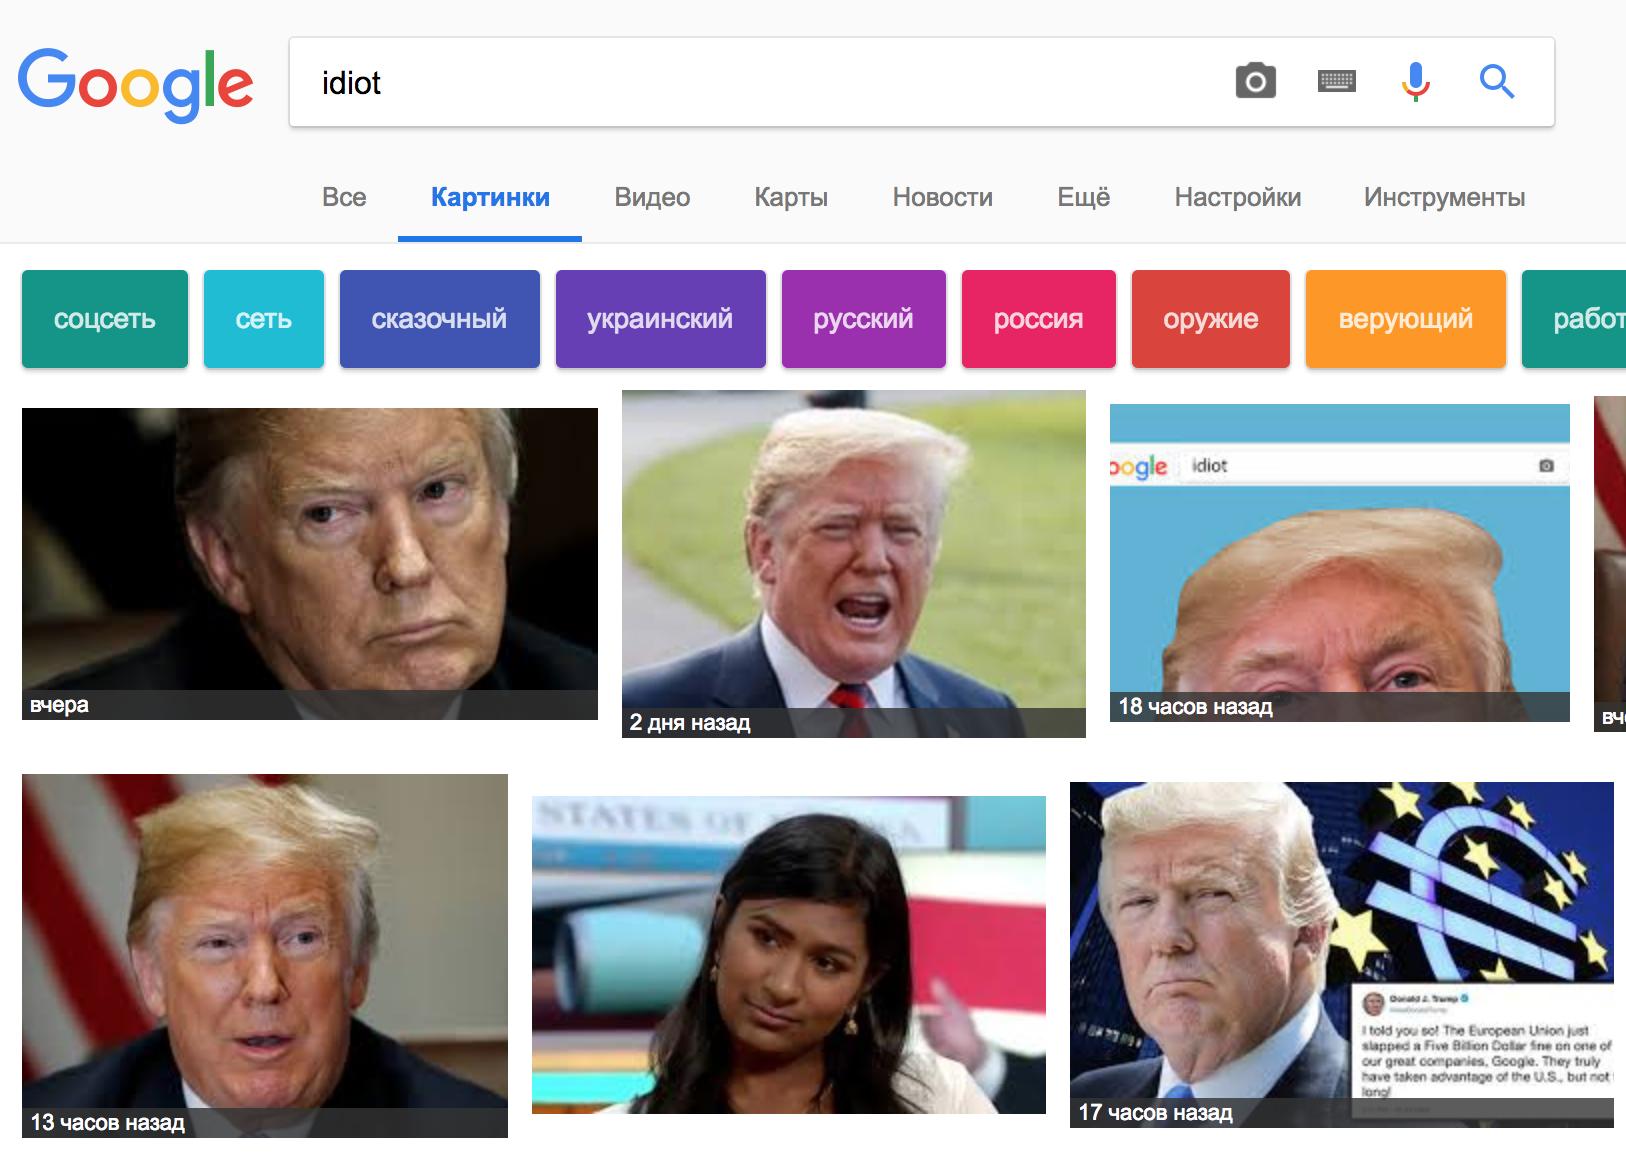 Картинки по запросу гугл считает трампа идиотом